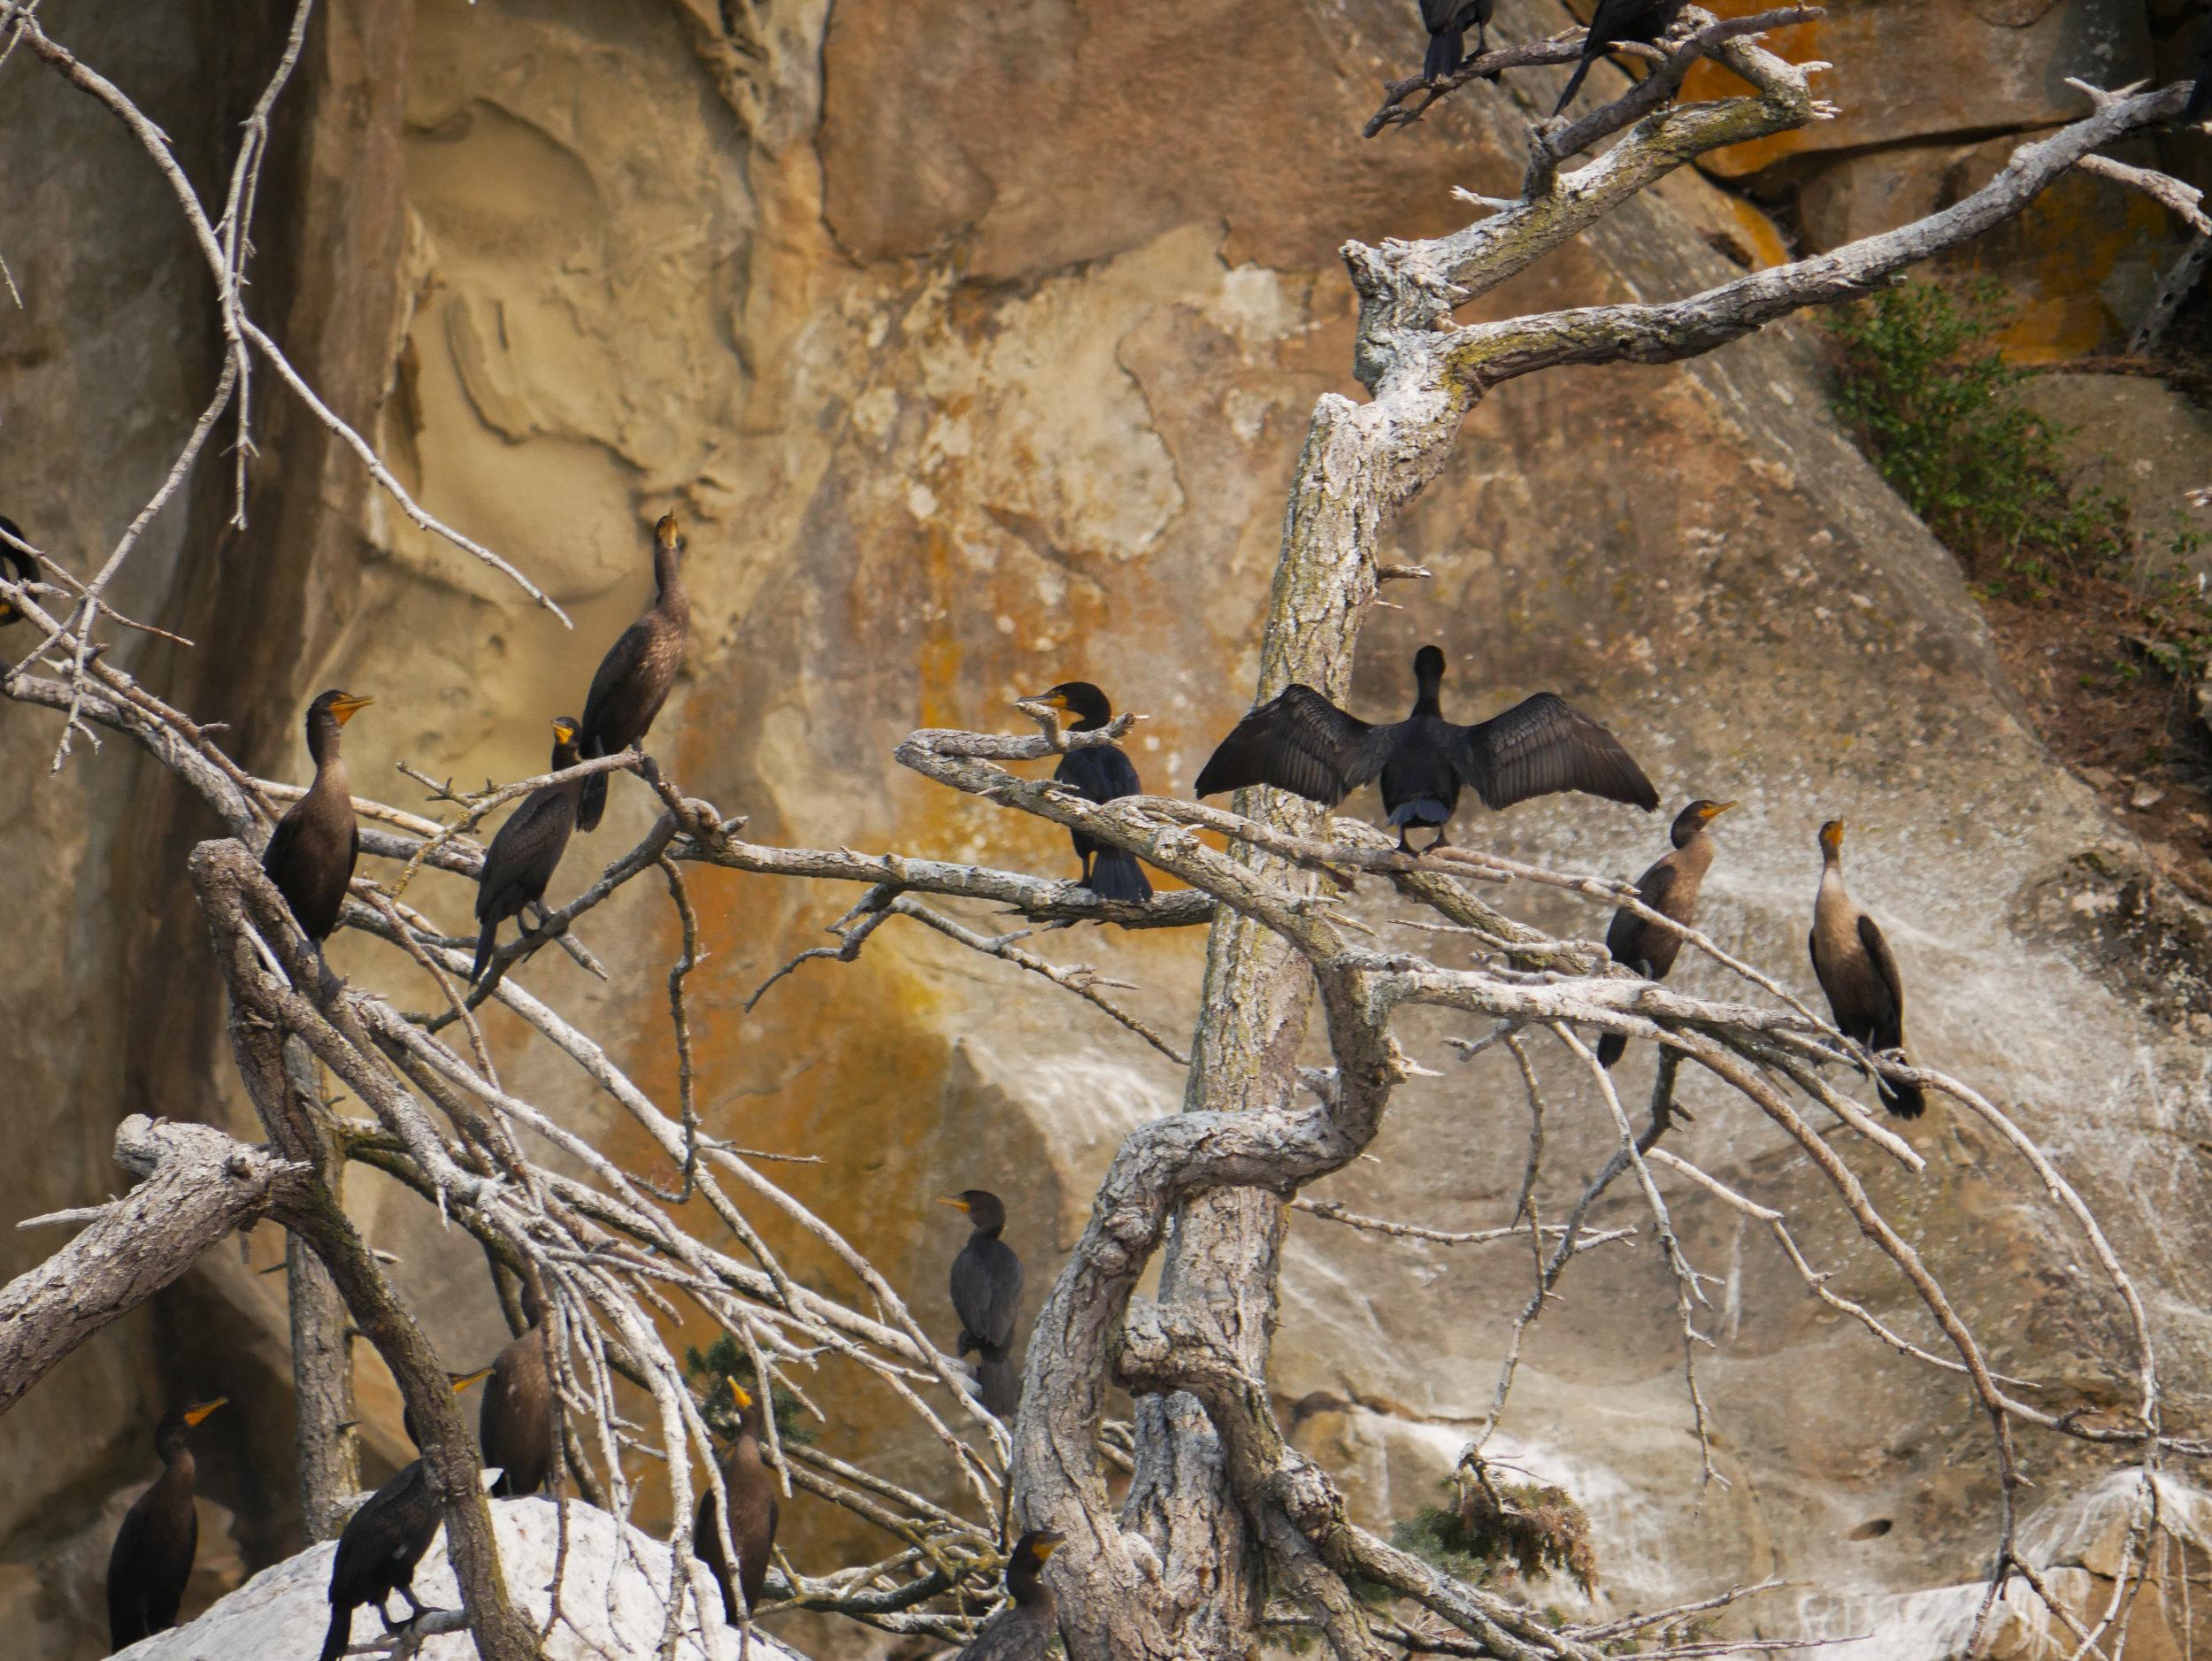 Many juvenile Double-crested cormorants taking a break on an old tree near Gabriola Island. Photo by Alanna Vivani